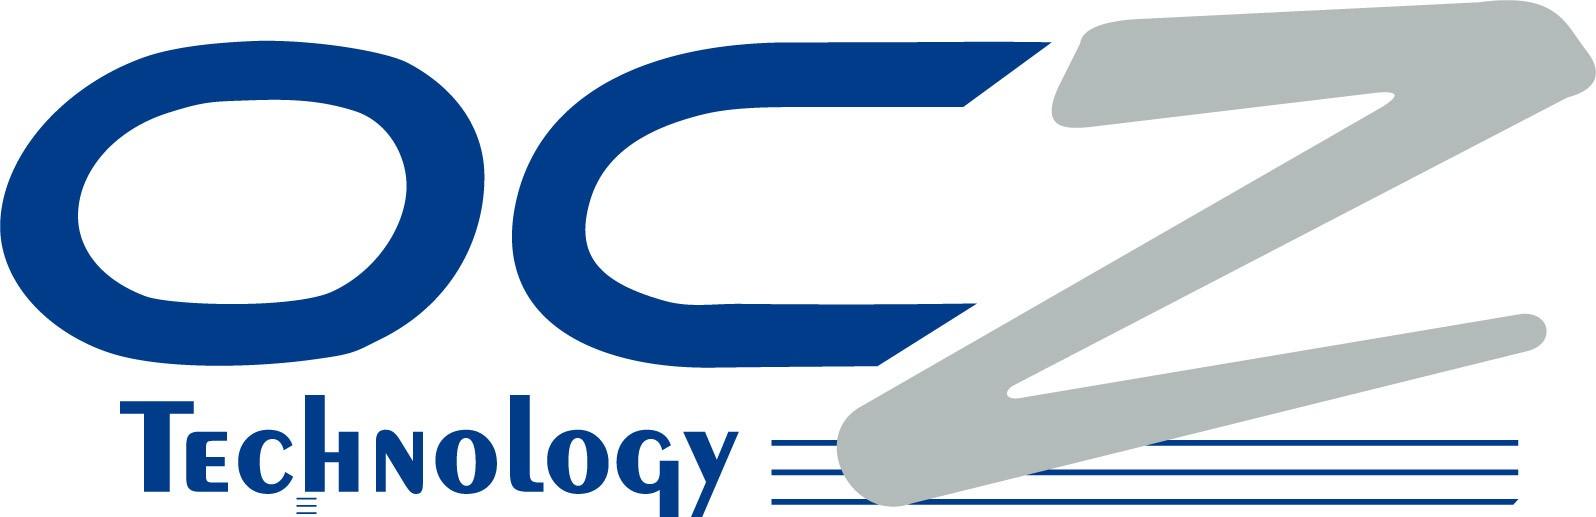 OCZ TECHNOLOGY